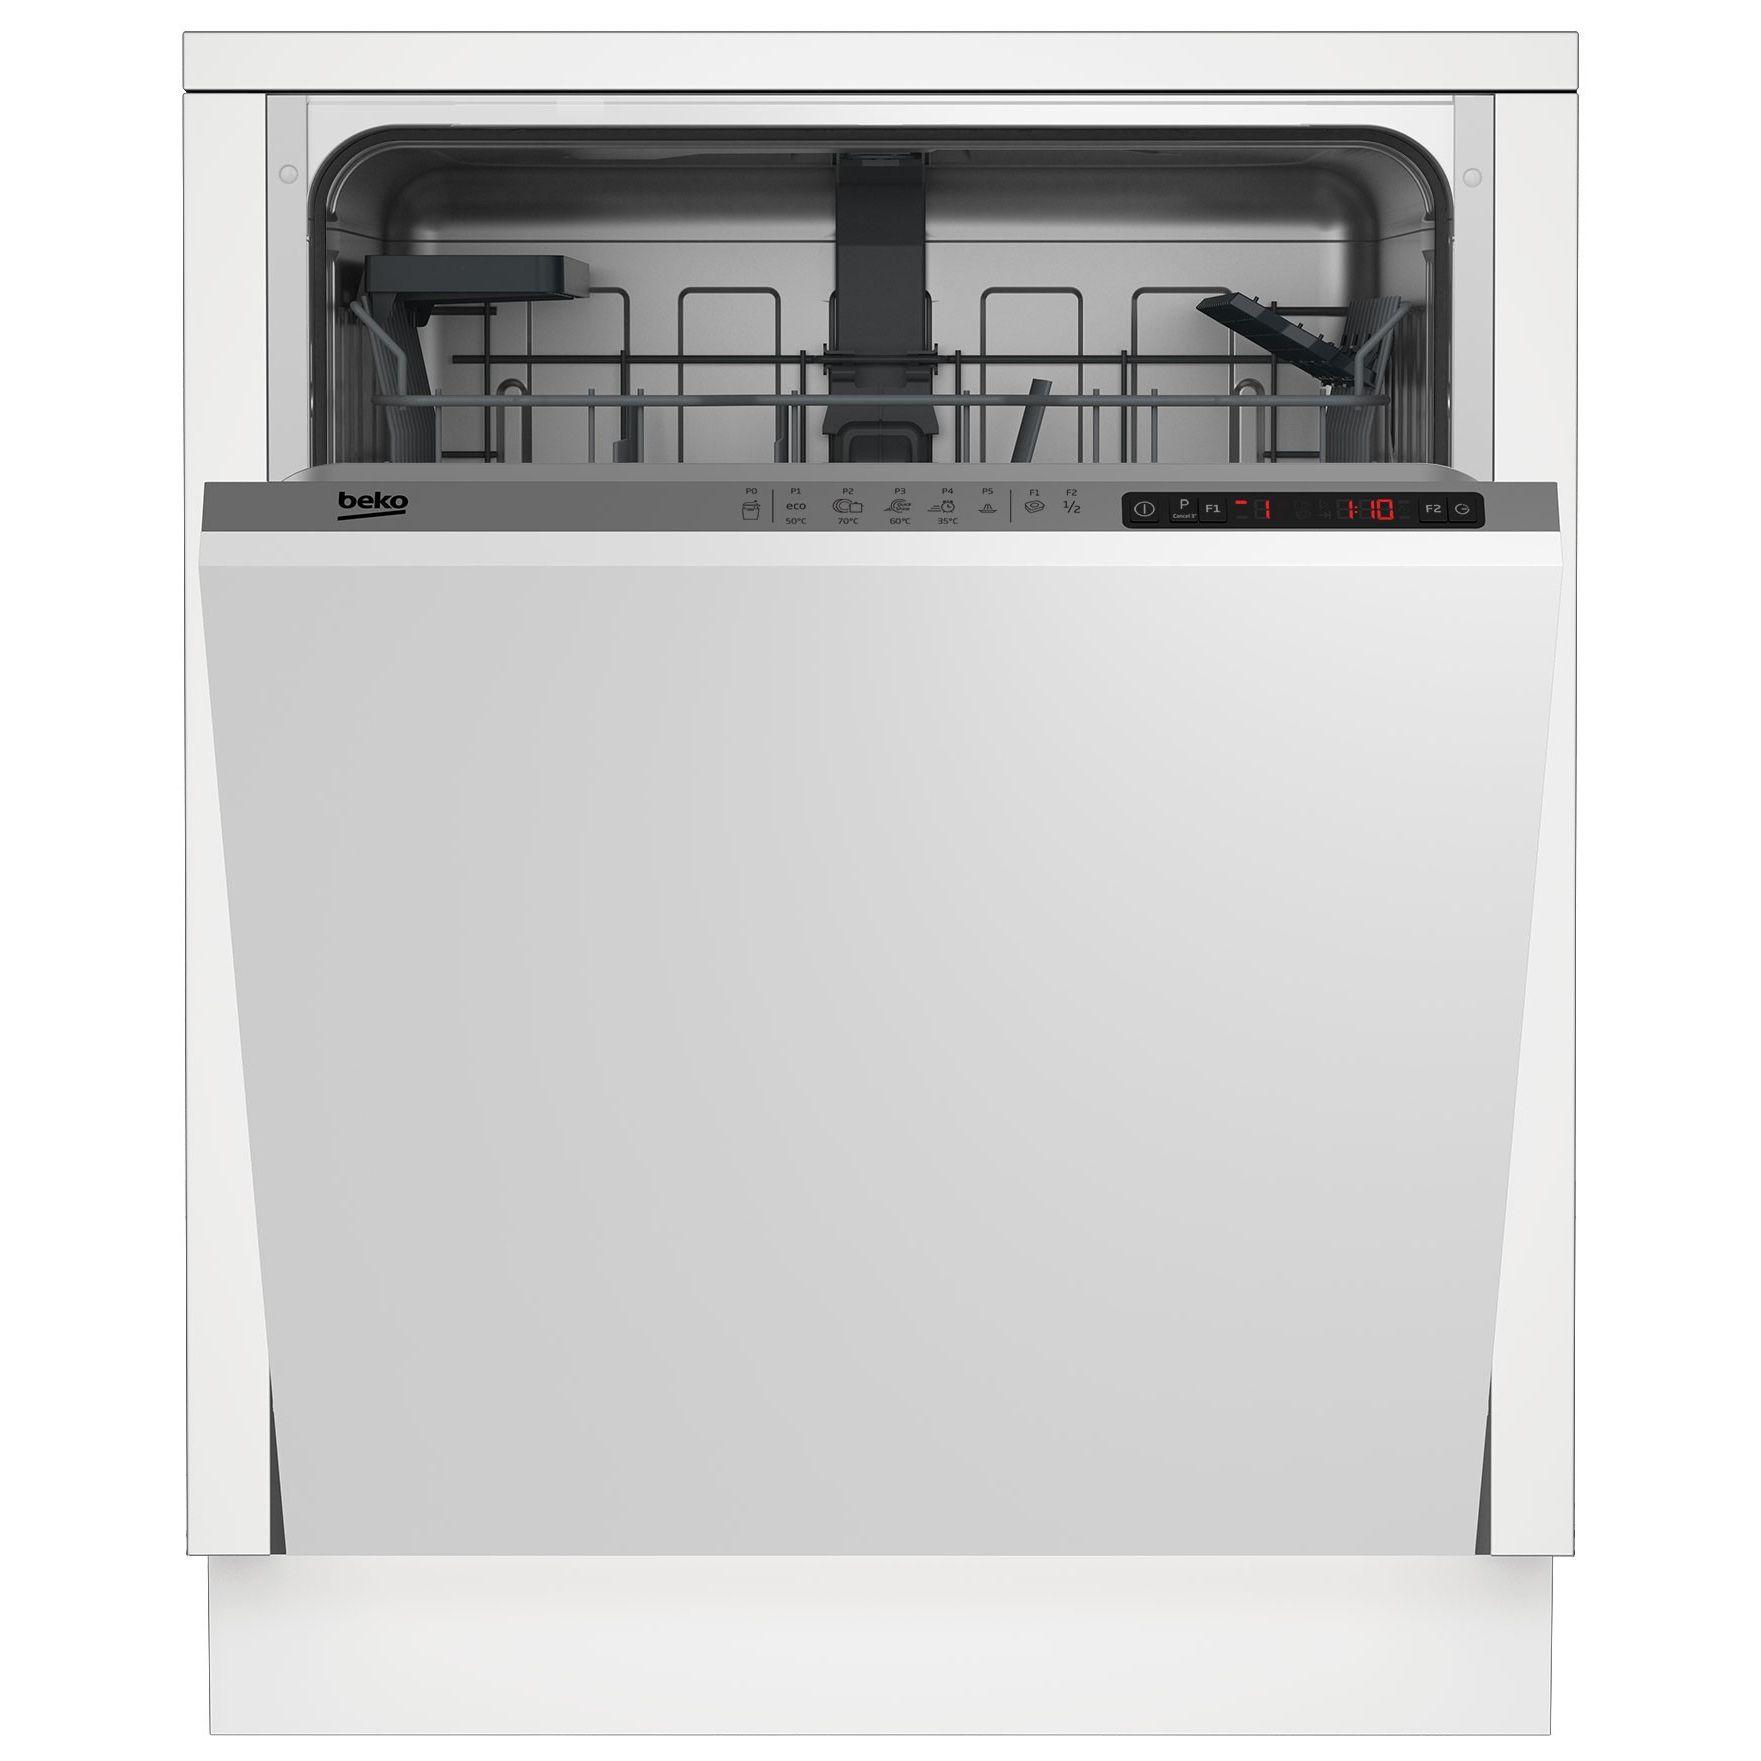 Masina de spalat vase incorporabila Beko DIN25310, 13 seturi, A+, Eco 50, Min 30, Alb